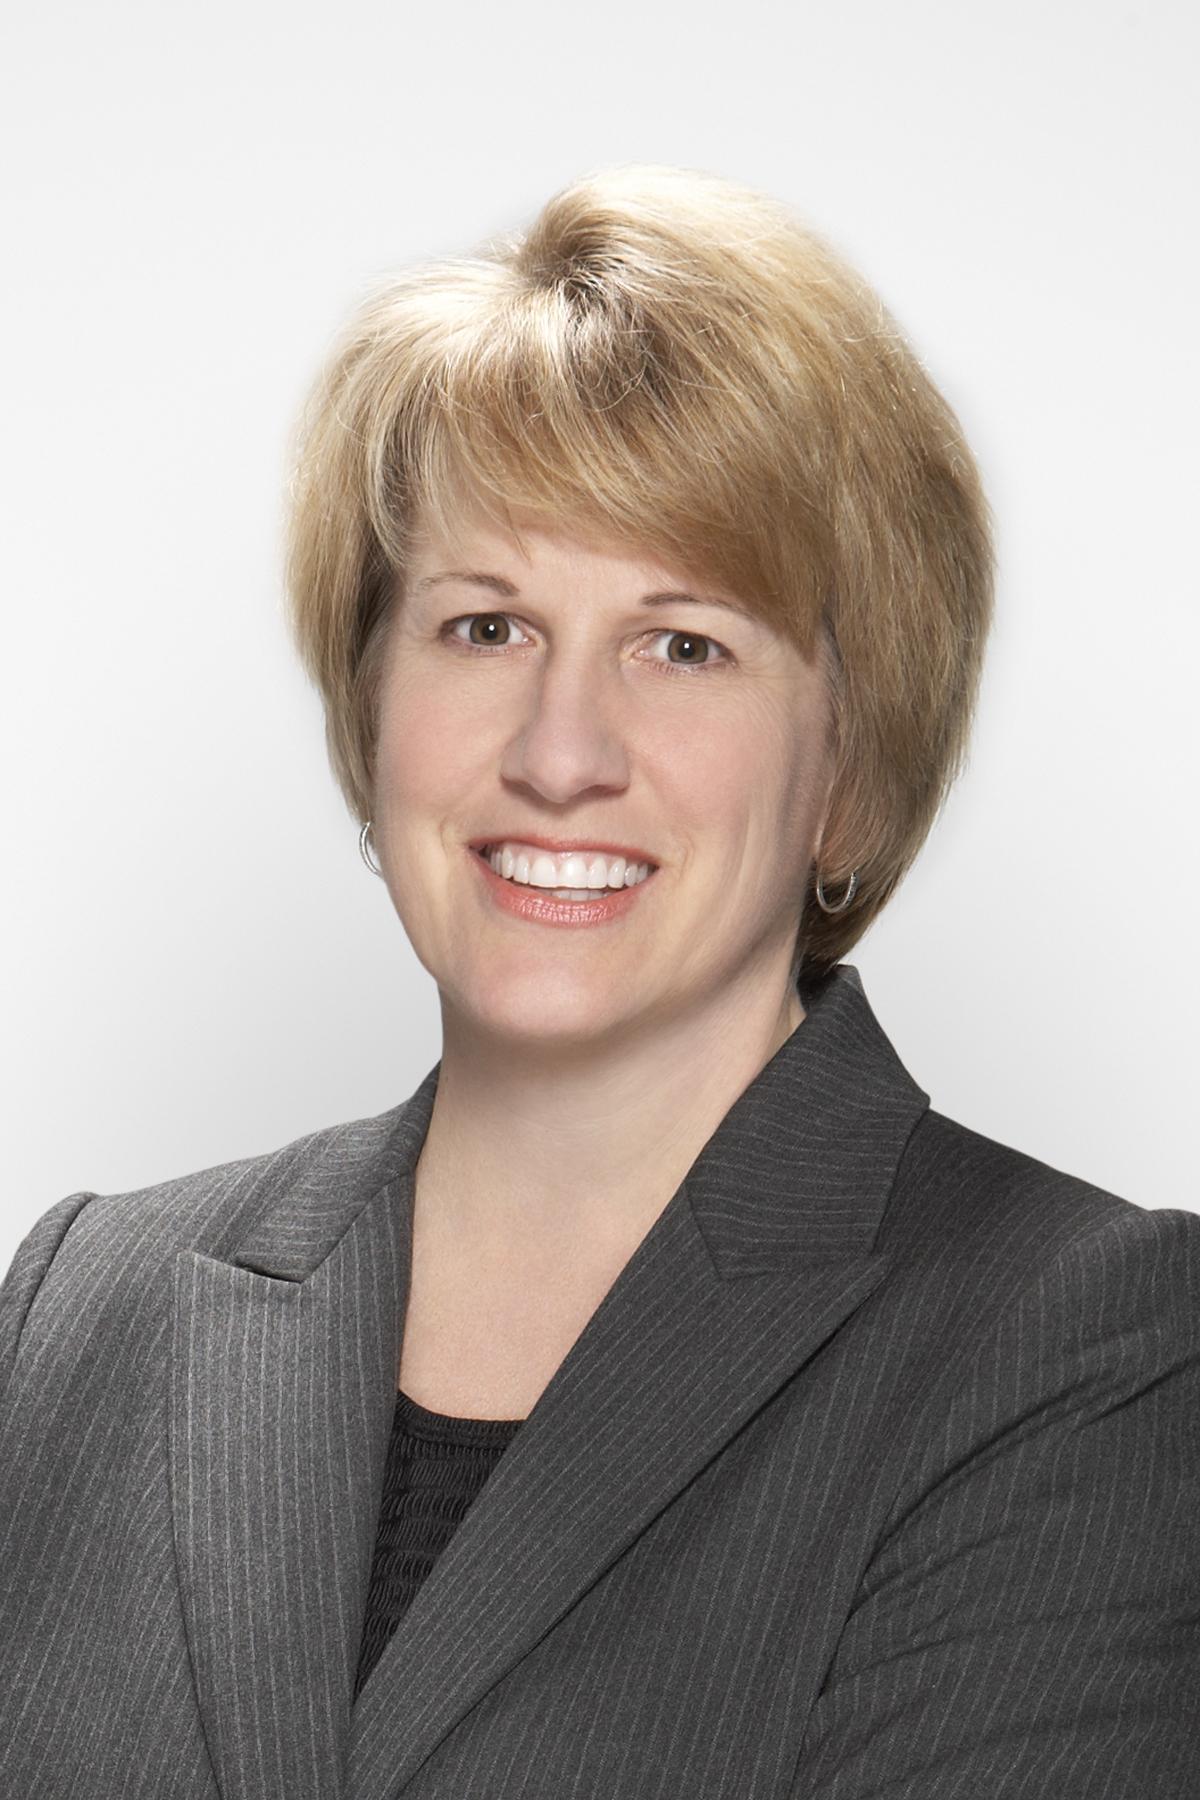 Cheryl Prahl